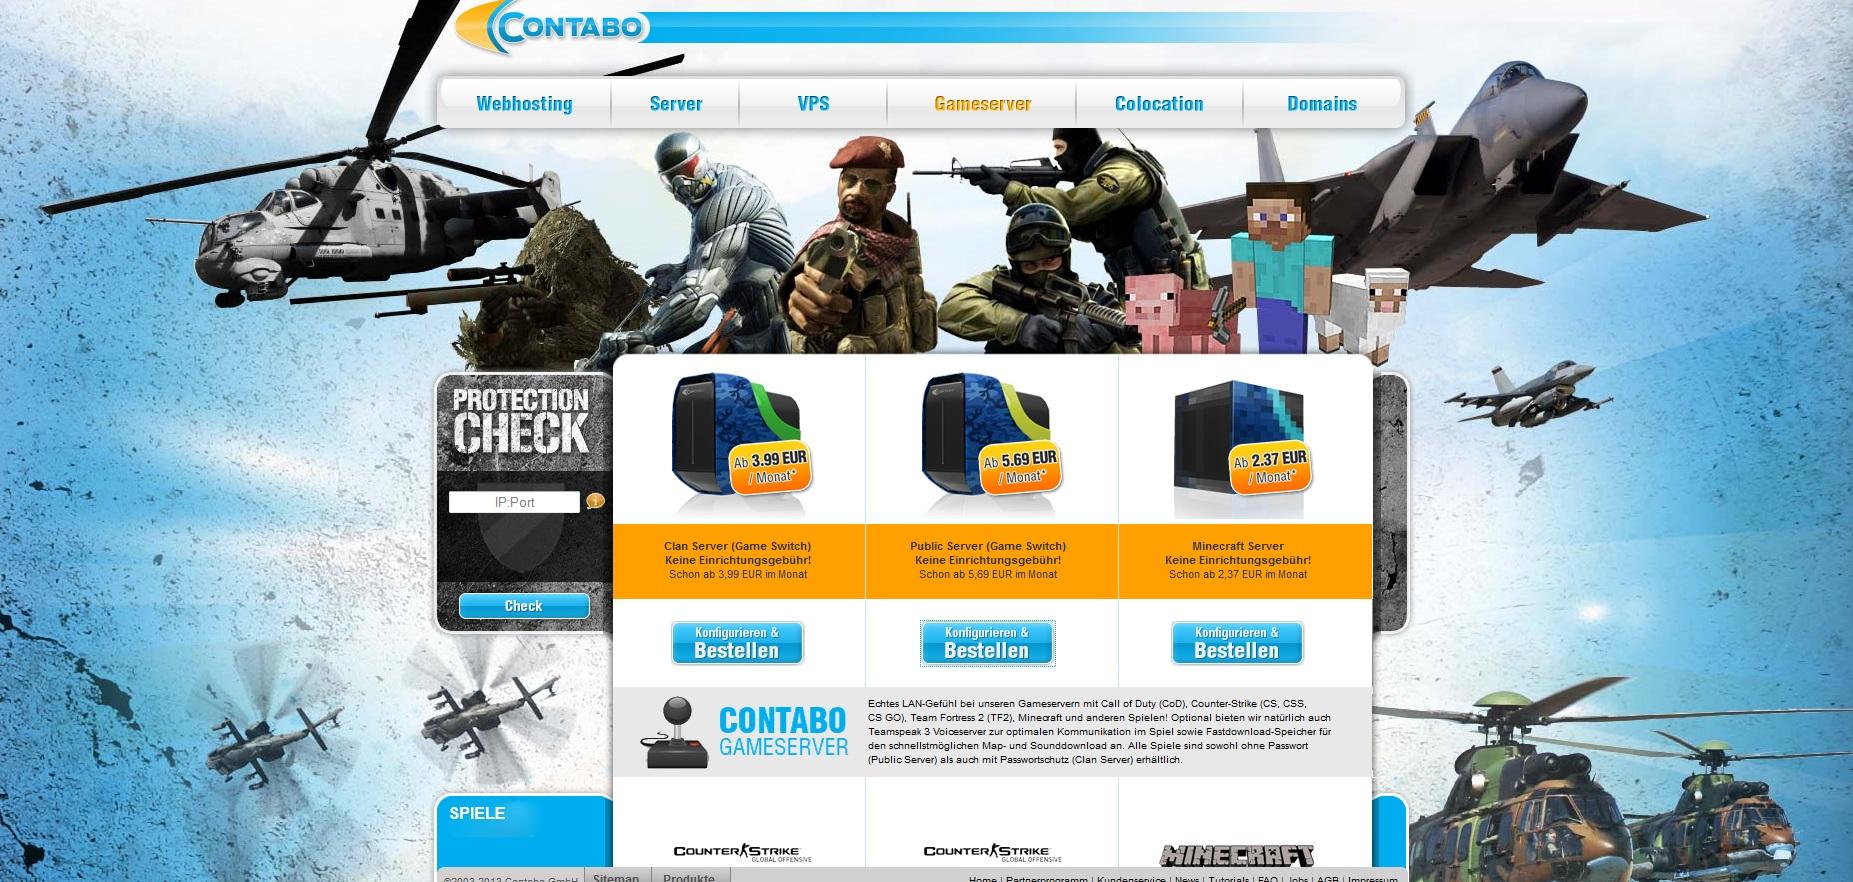 contabo_gameserver